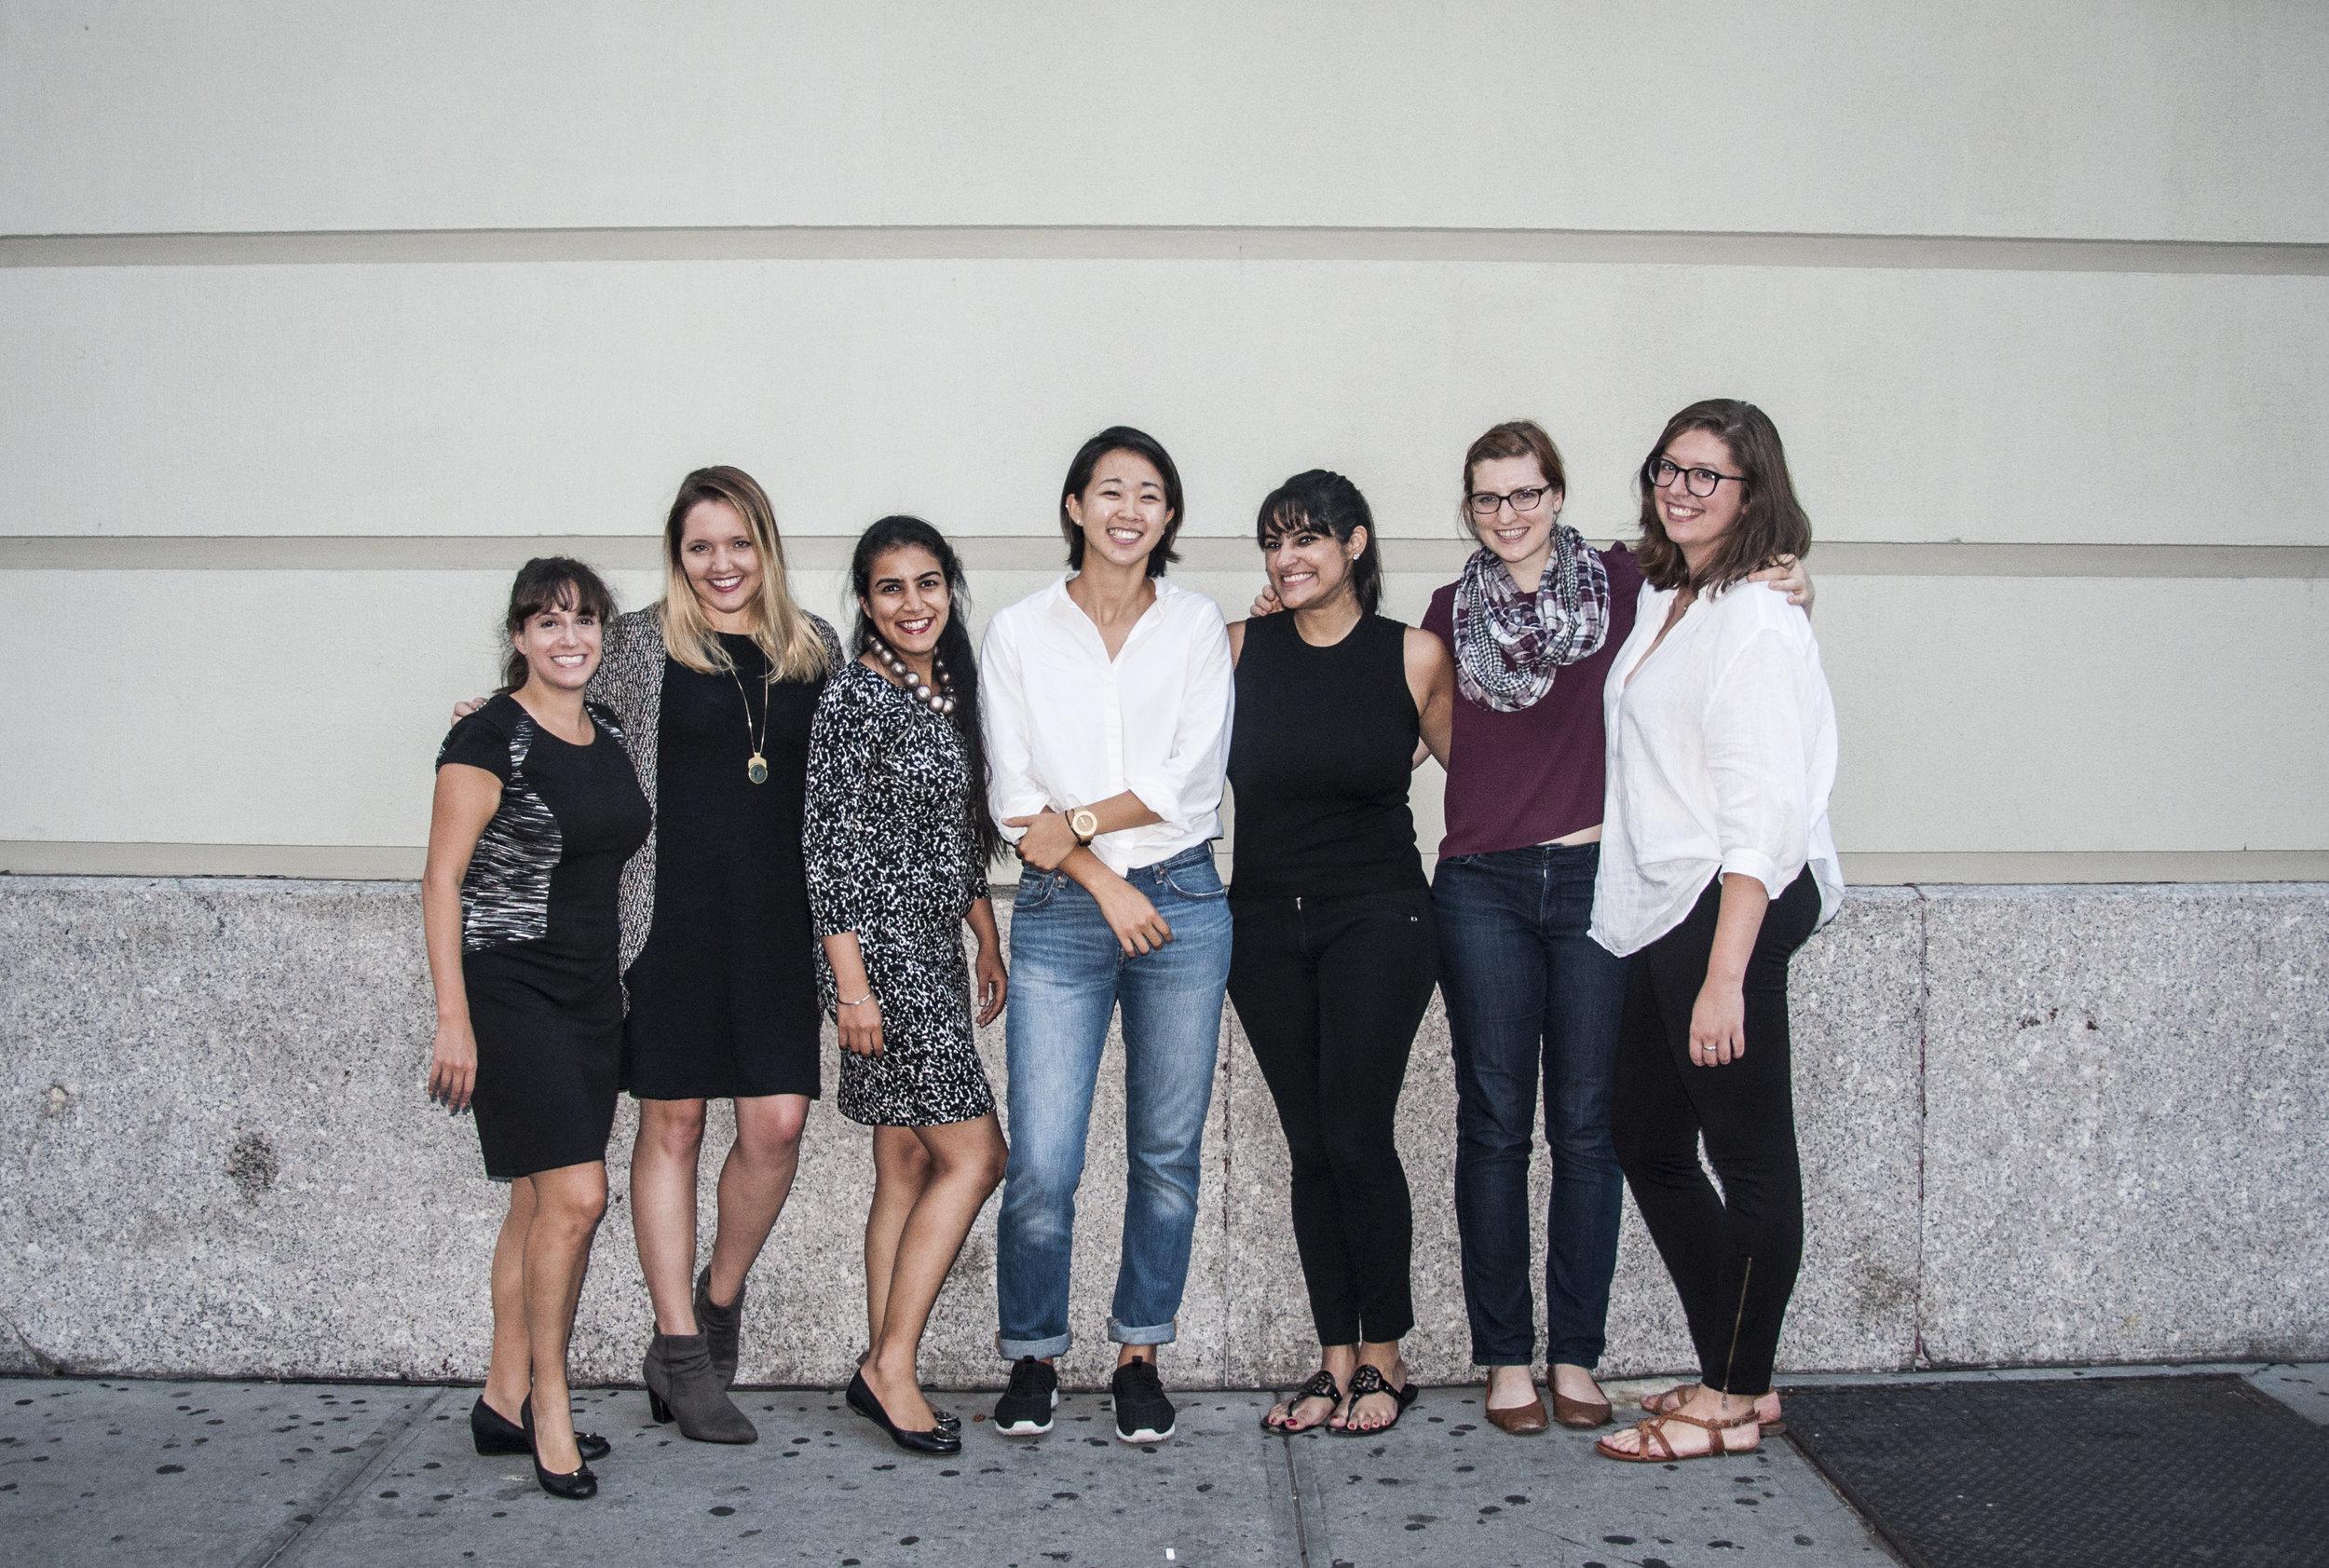 (left to right) Maya, Nicole, Kiran, Amy, Shivani, Beth, Alicia